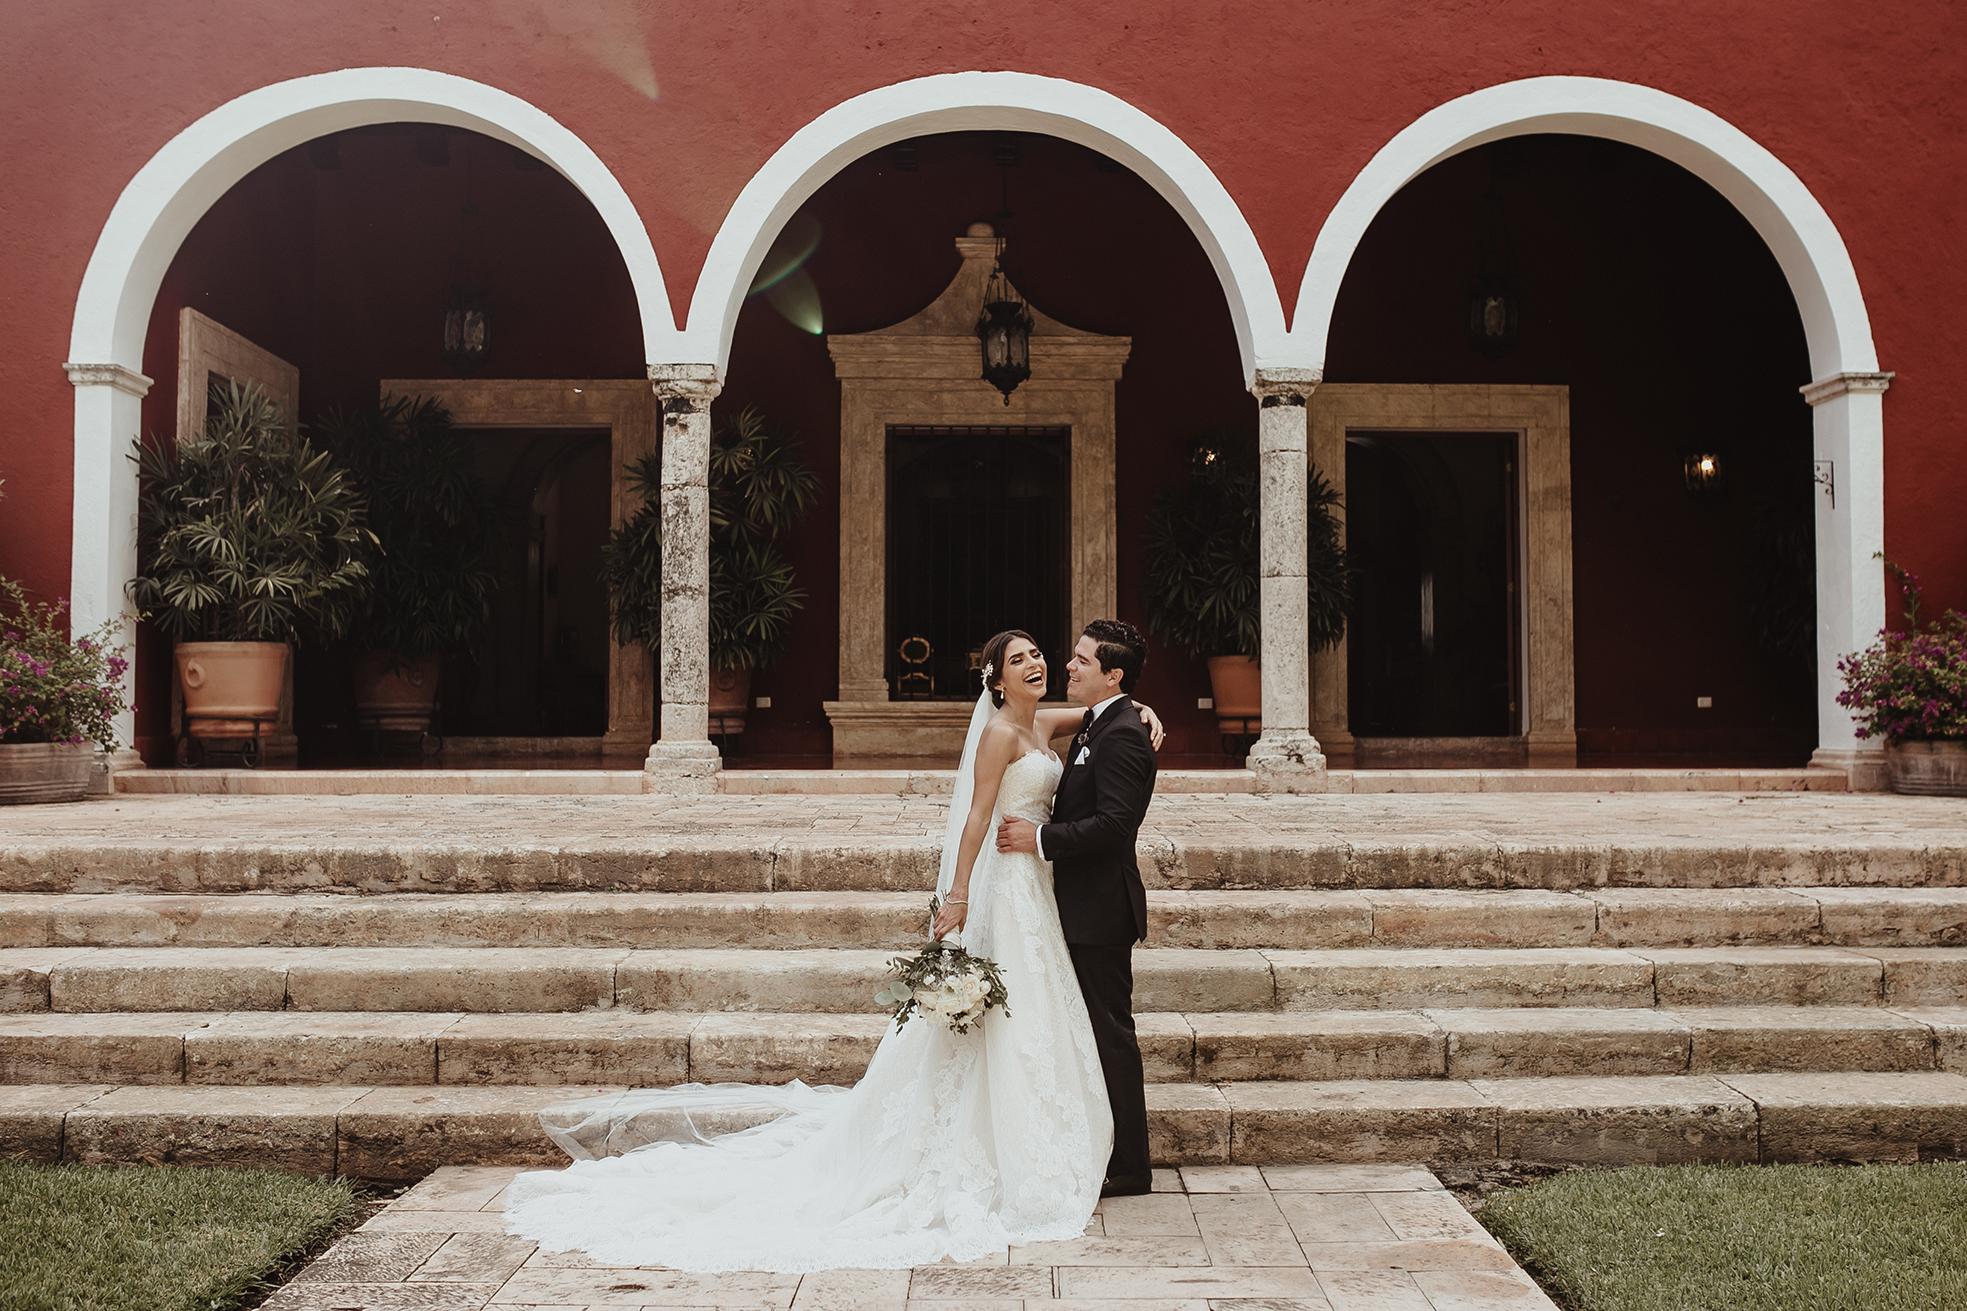 0136F&Yslide_WeddingDstination_MeridaYucatan_HaciendasMerida_BodasMexico_BodasYucatan_Boda_Destino.jpg